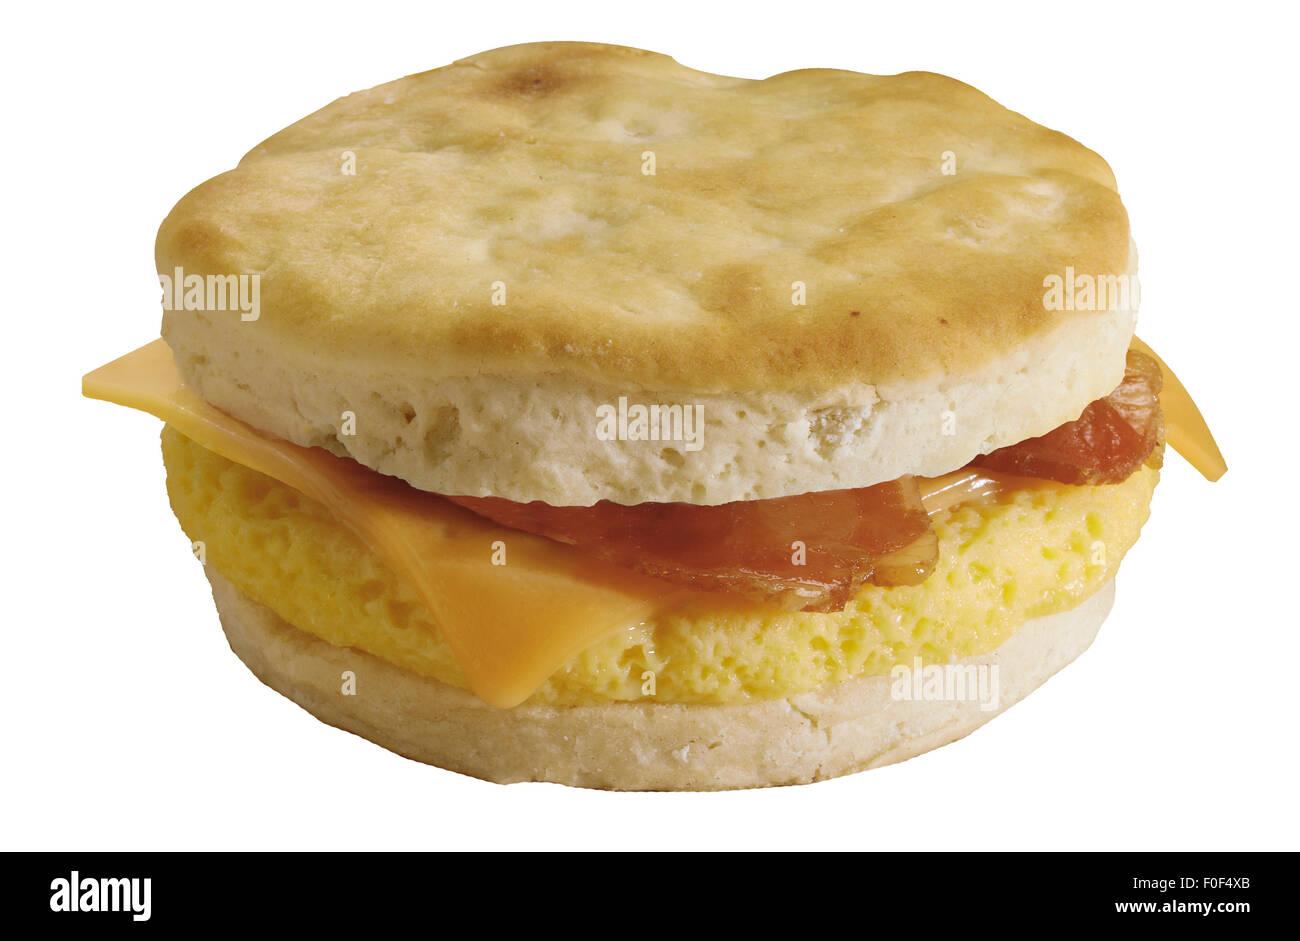 Breakfast Sandwich, Muffin, Cheese, Scrambled Egg, Bacon - Stock Image